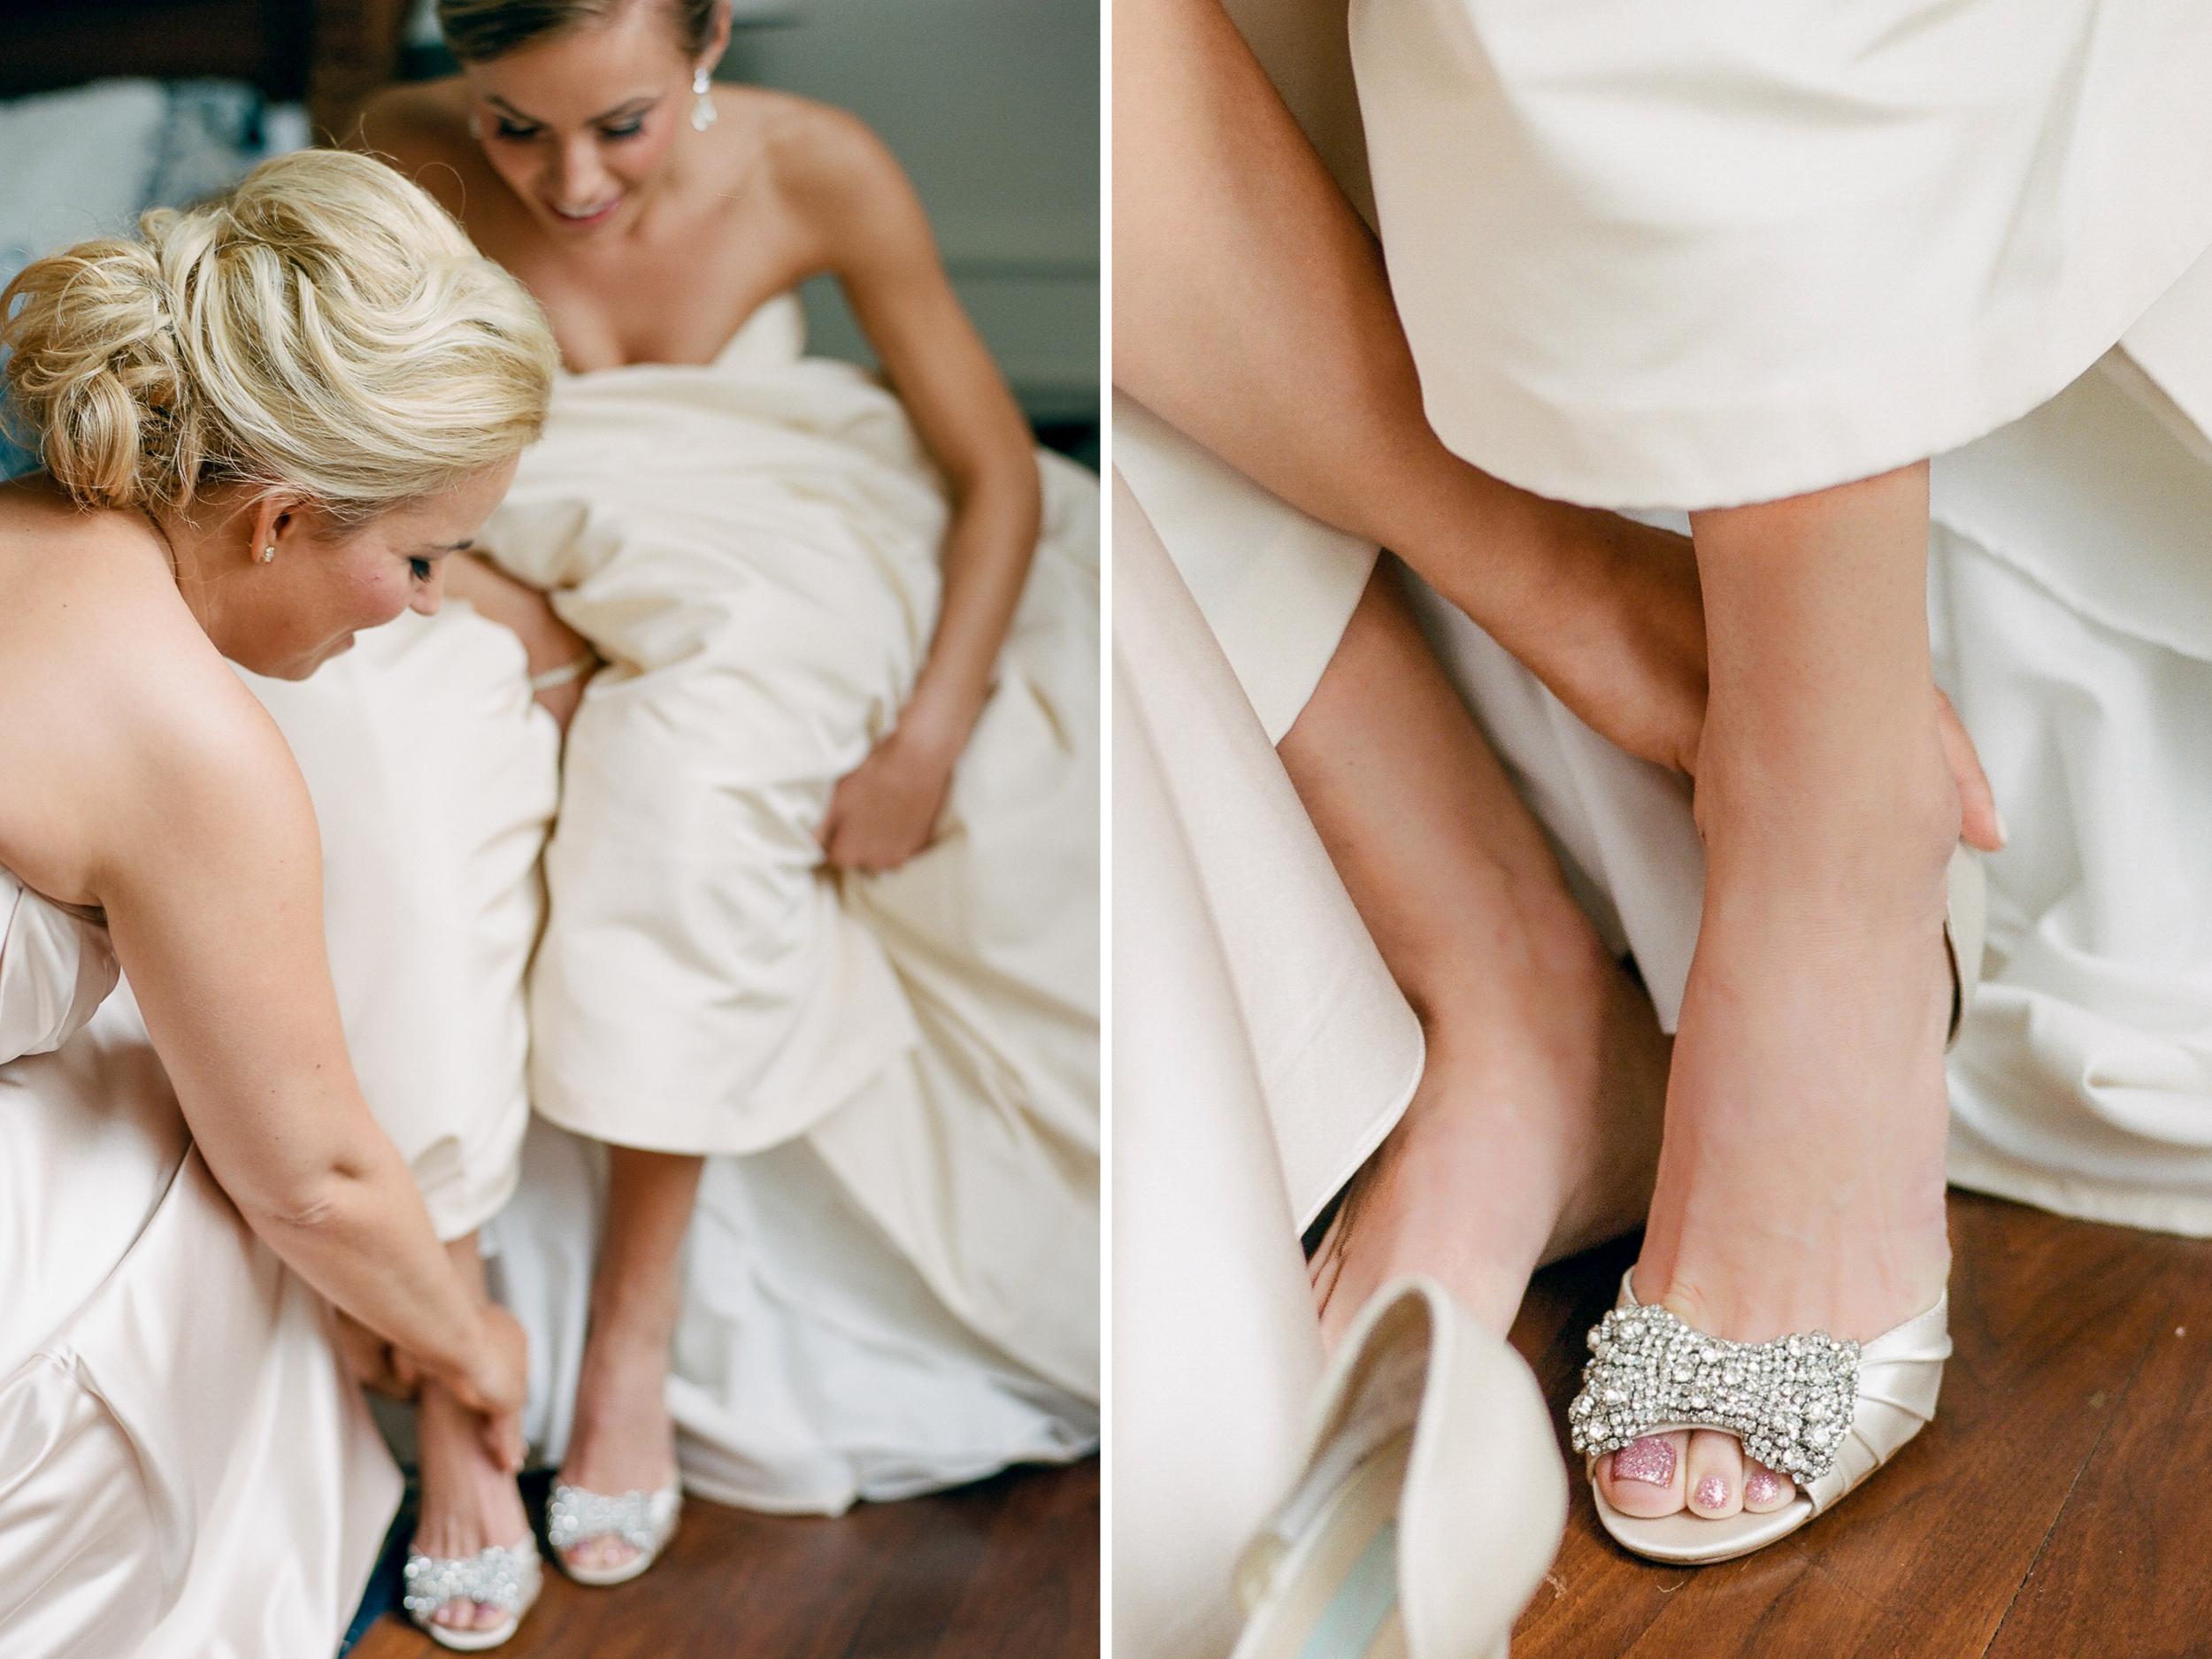 Dana-Fernandez-Photography-Houston-Wedding-Photographer-Style-Me-Pretty-Film-Texas-Destination-Photographer-107.jpg